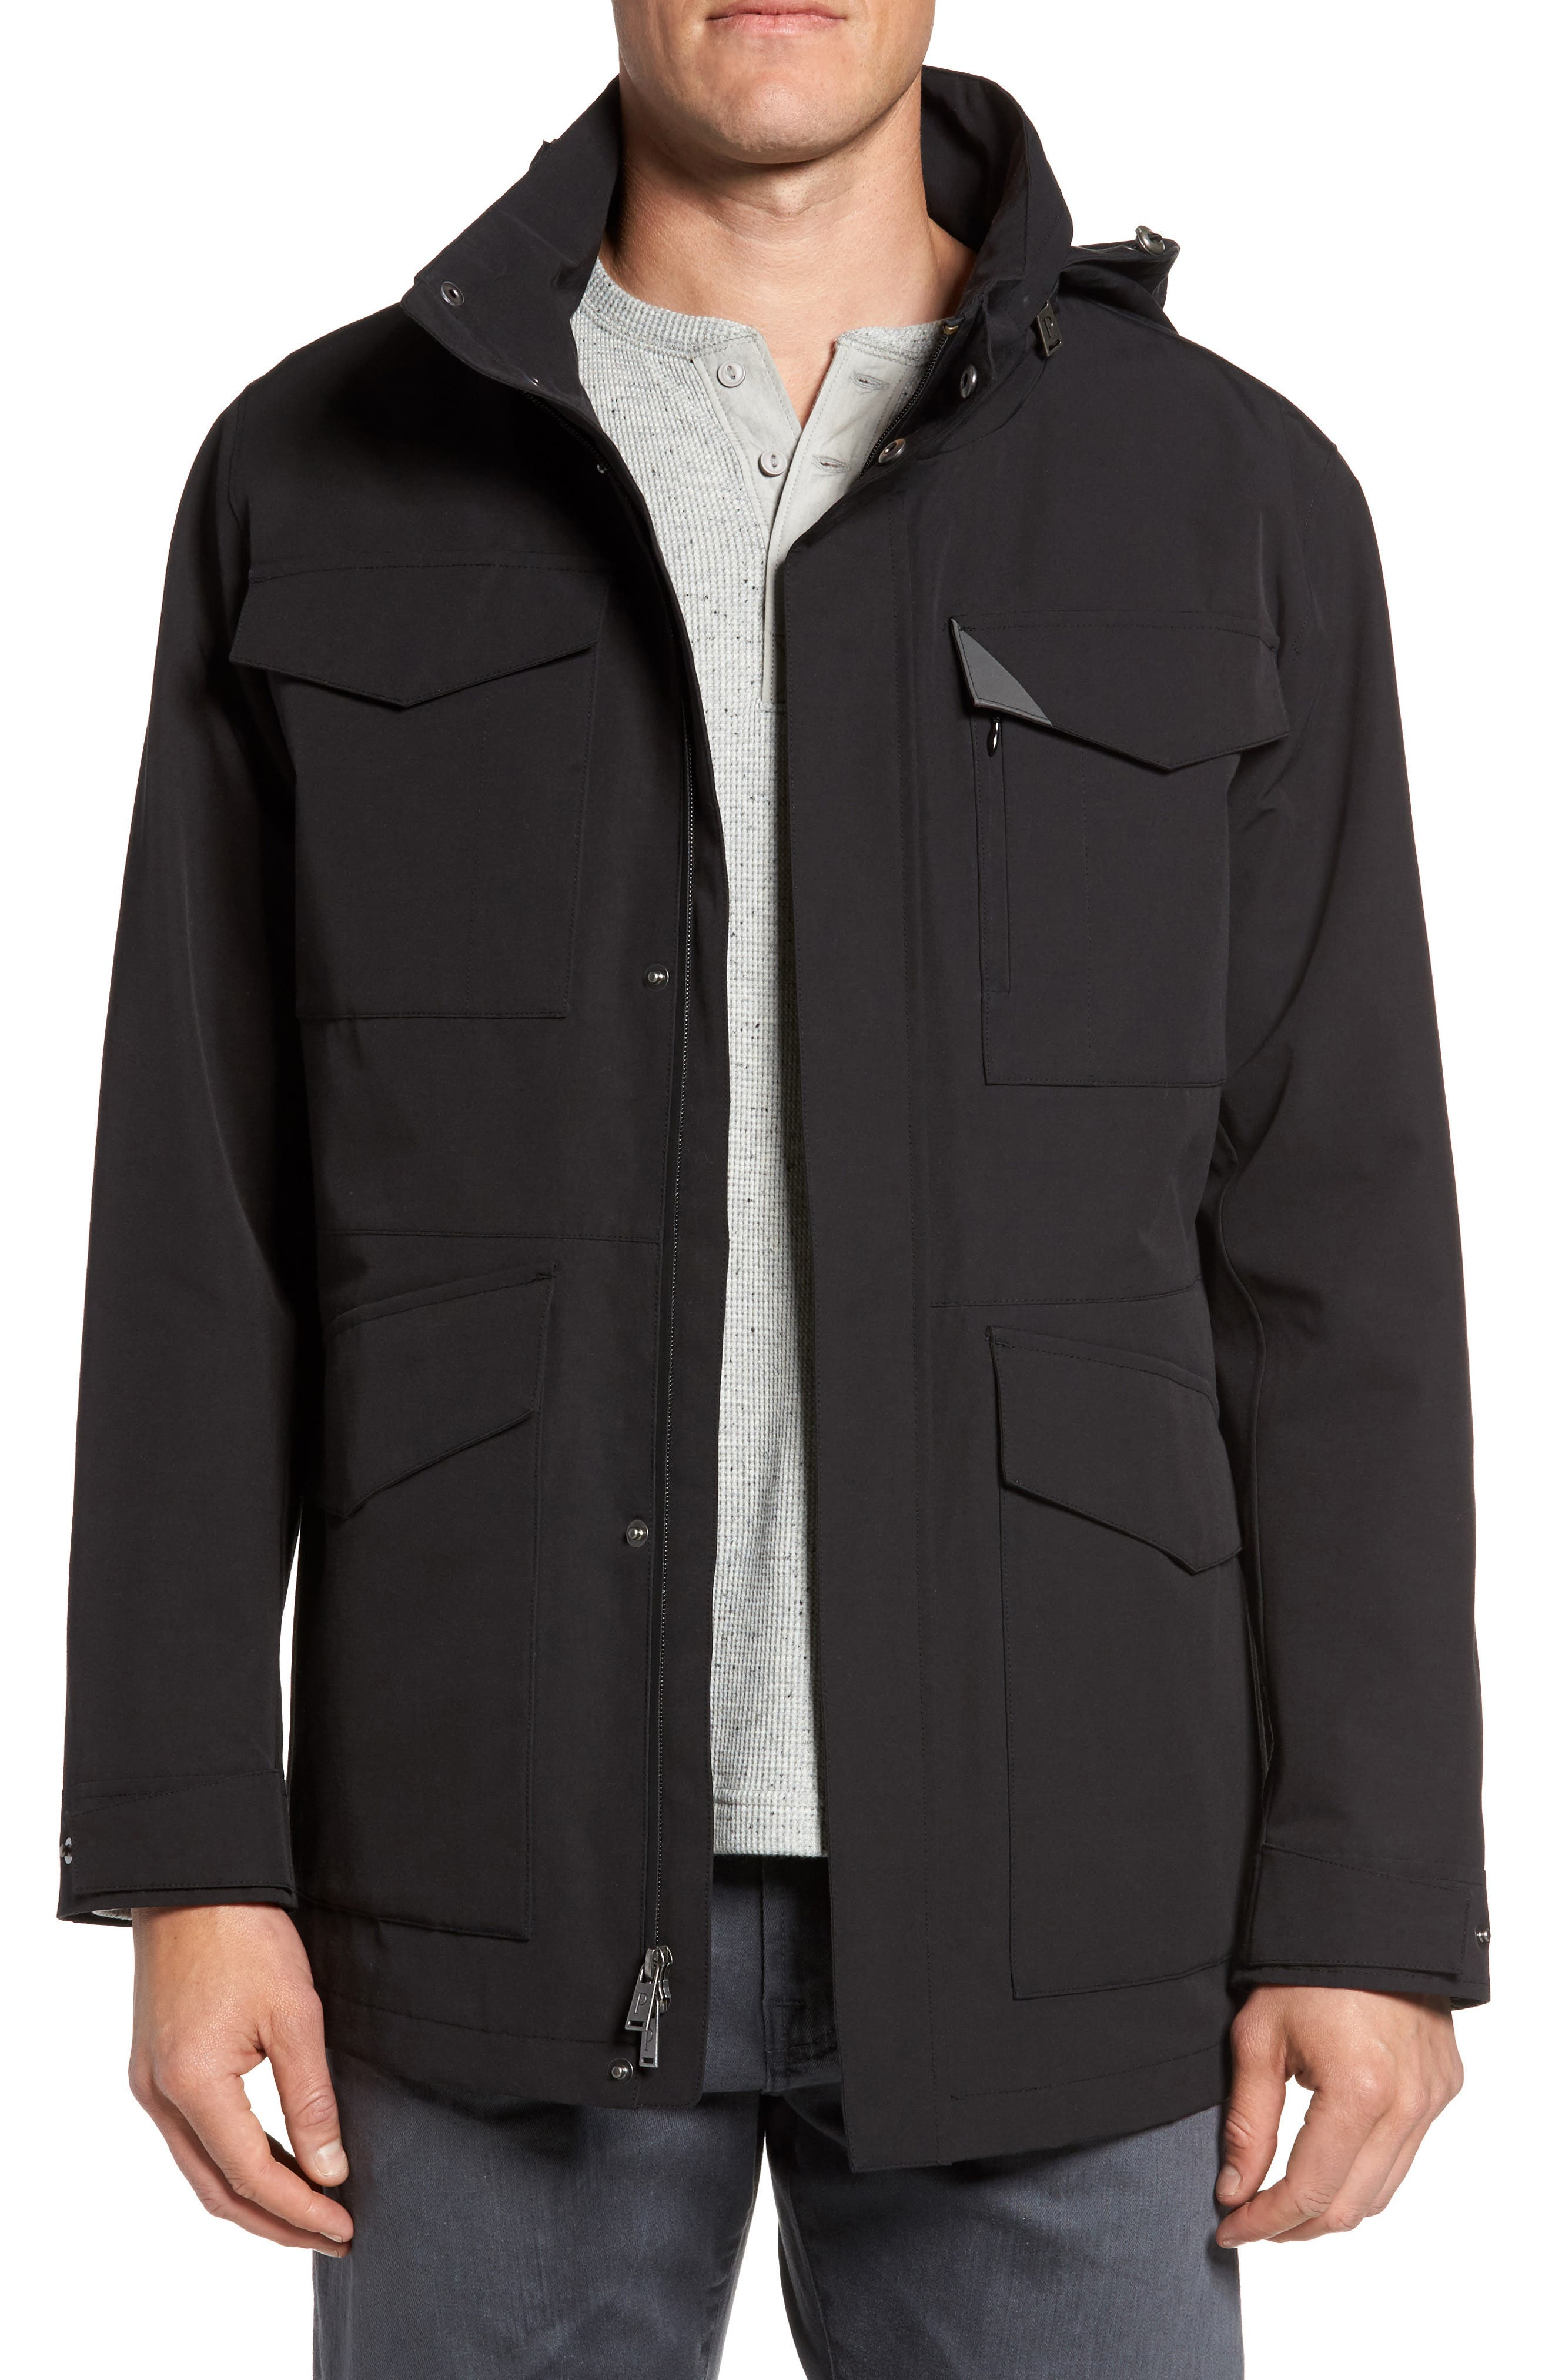 Main Image - Pendleton Clyde Hill Waterproof Field Jacket